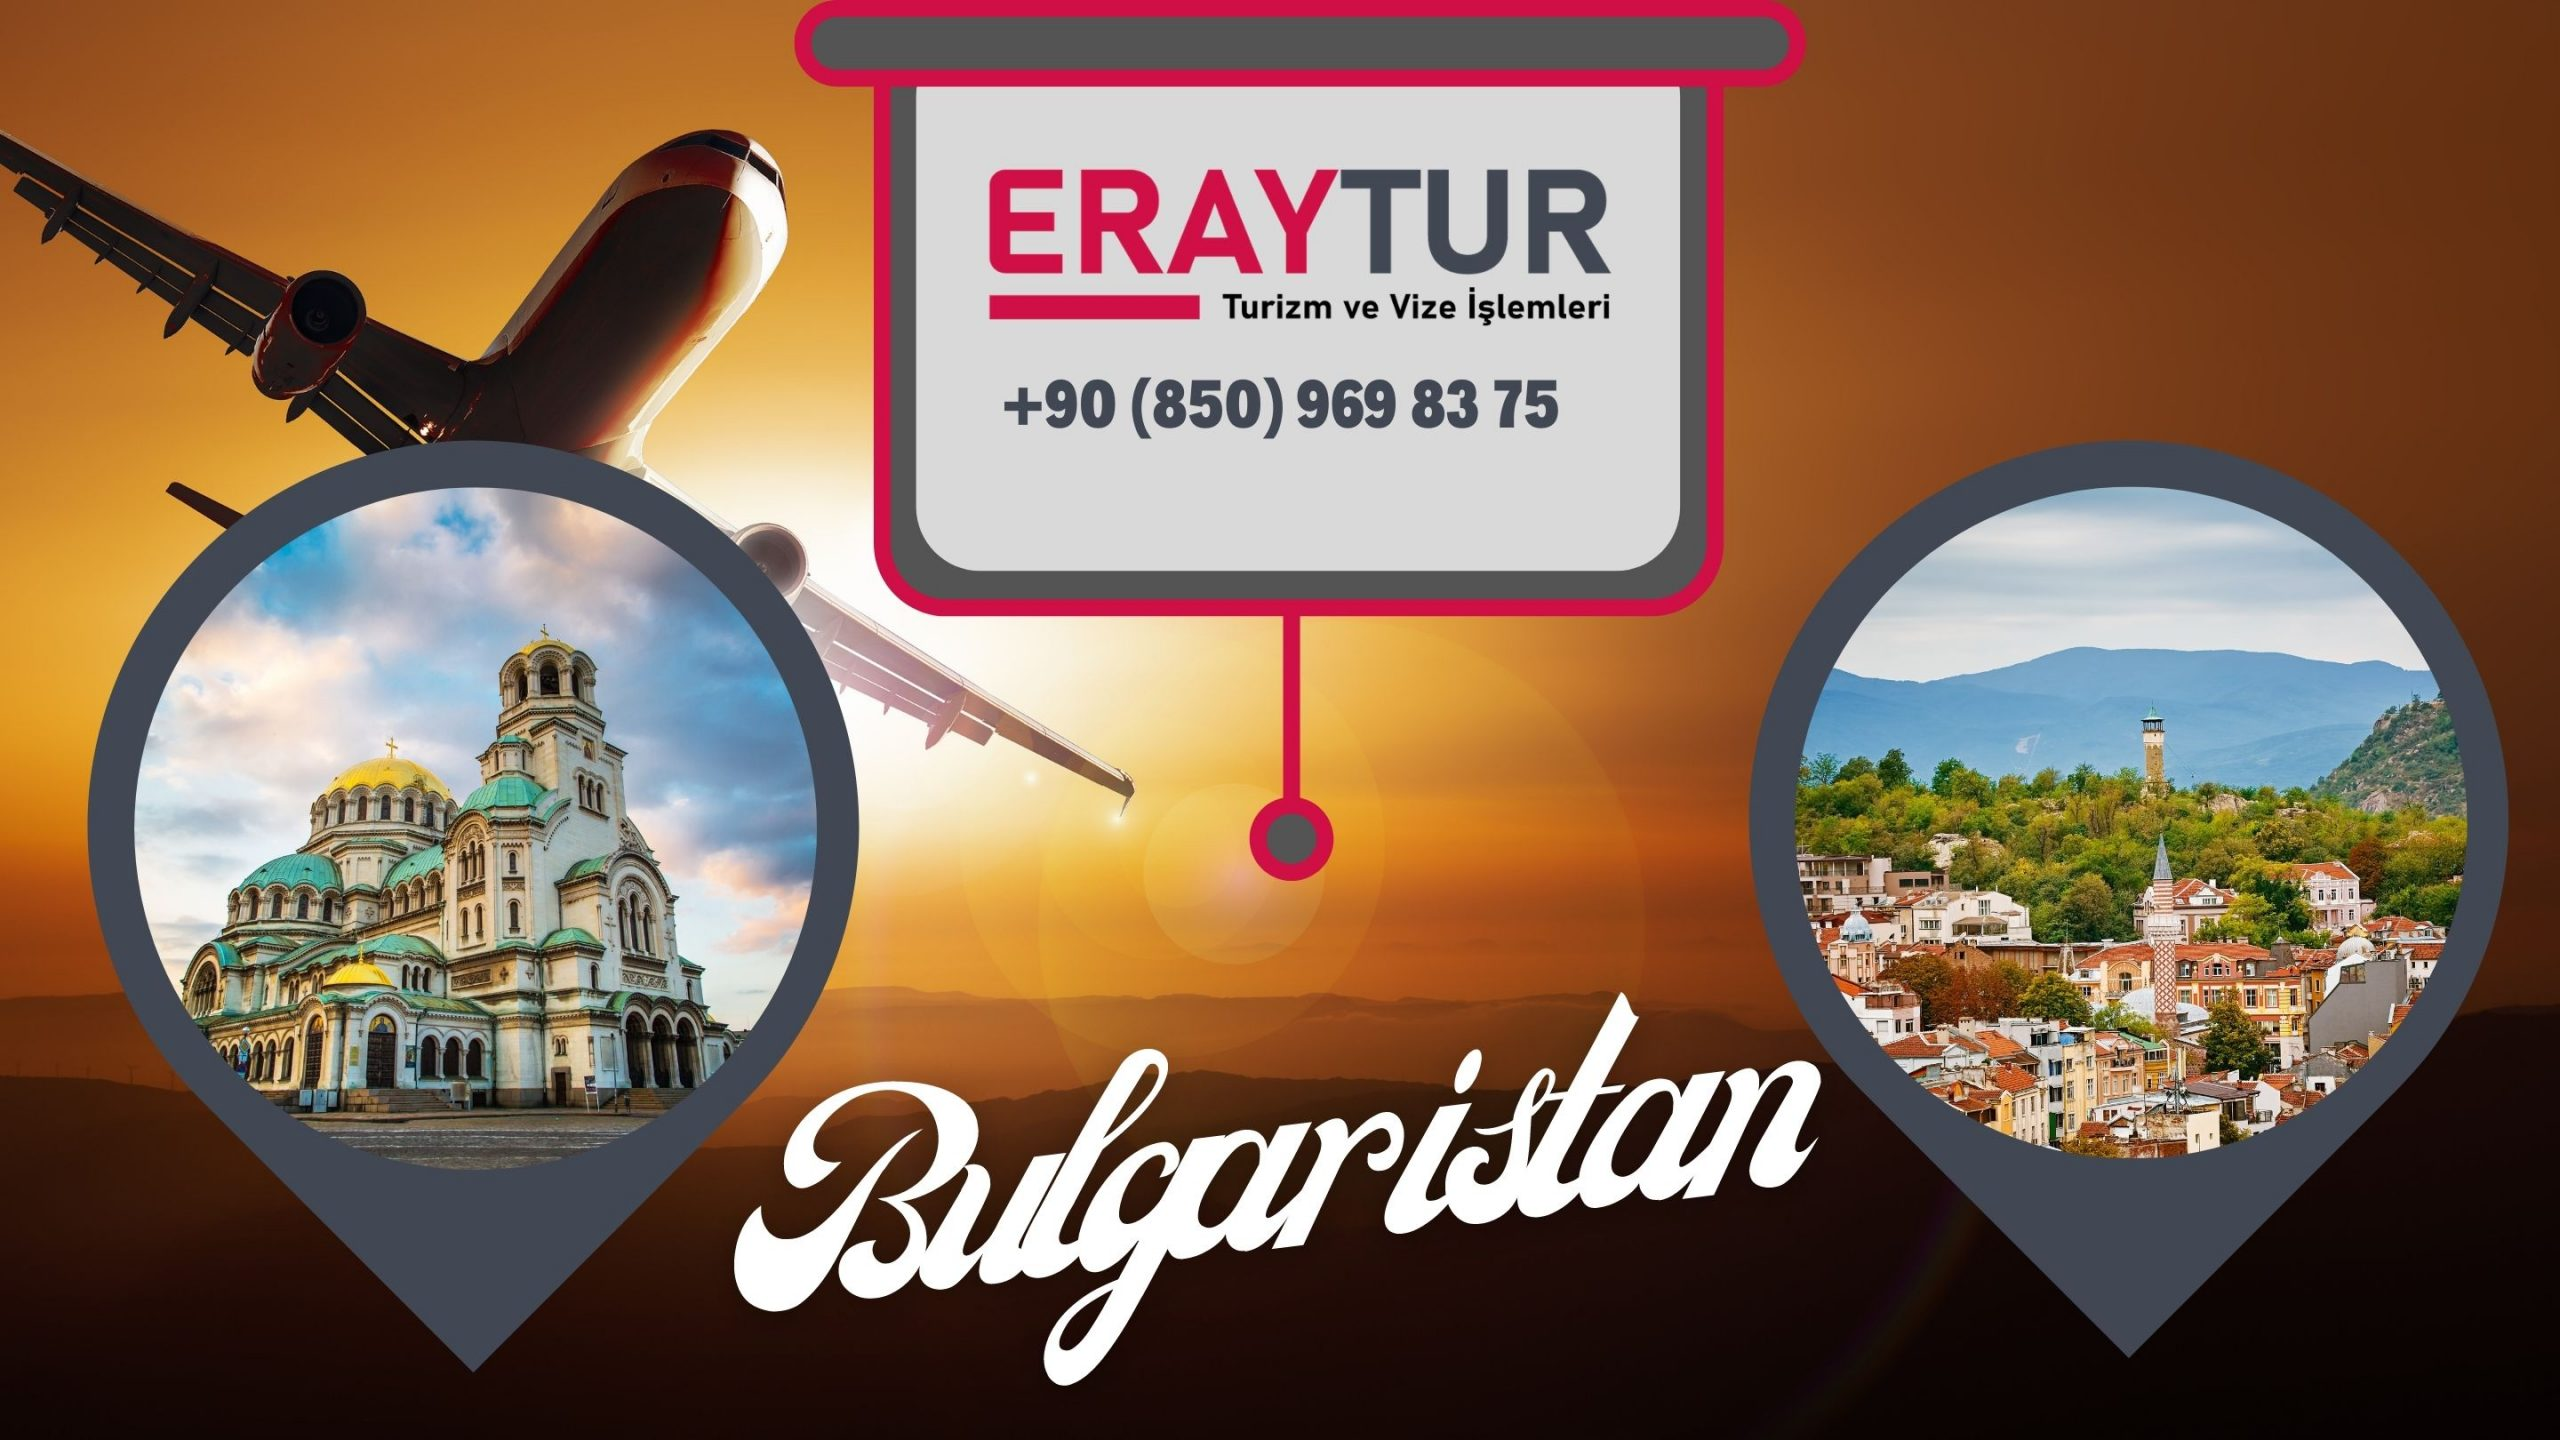 Bulgaristan Gezi Rehberi 2021 1 – bulgaristan gezi rehberi 2021 scaled